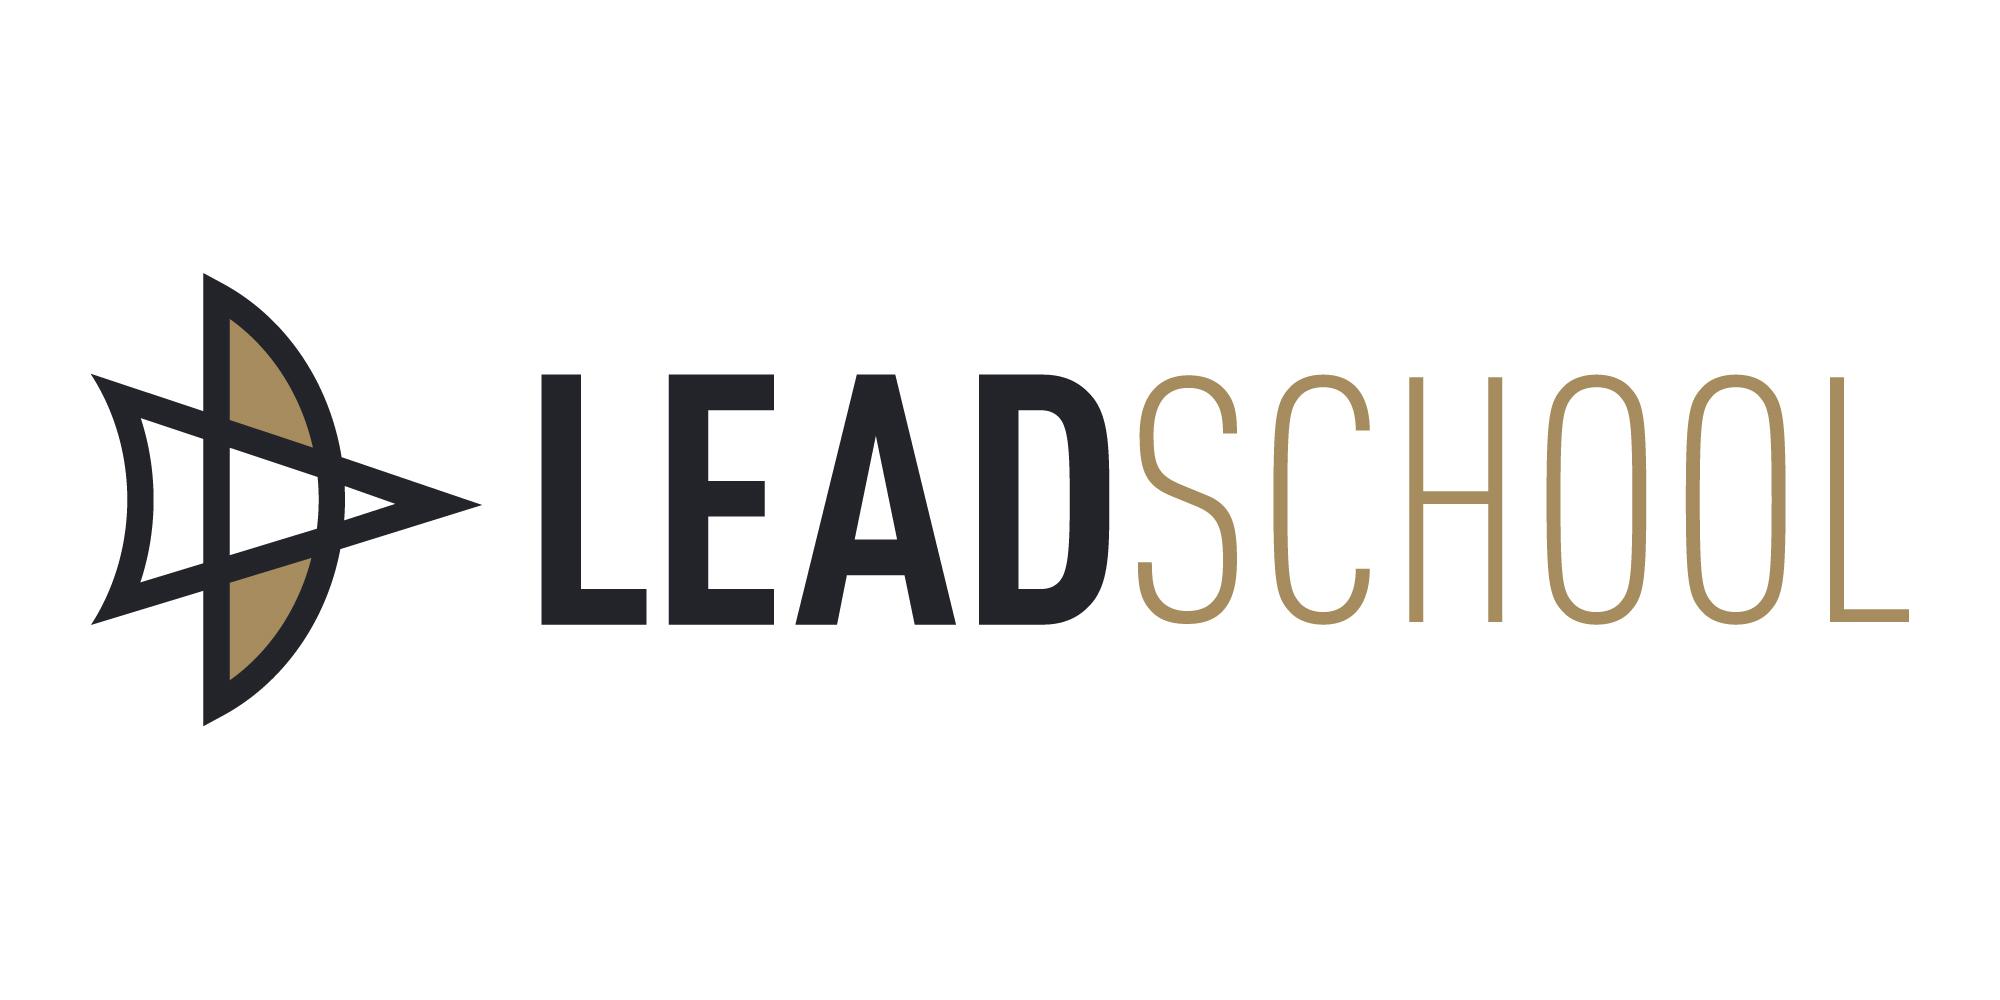 leadschool.jpg